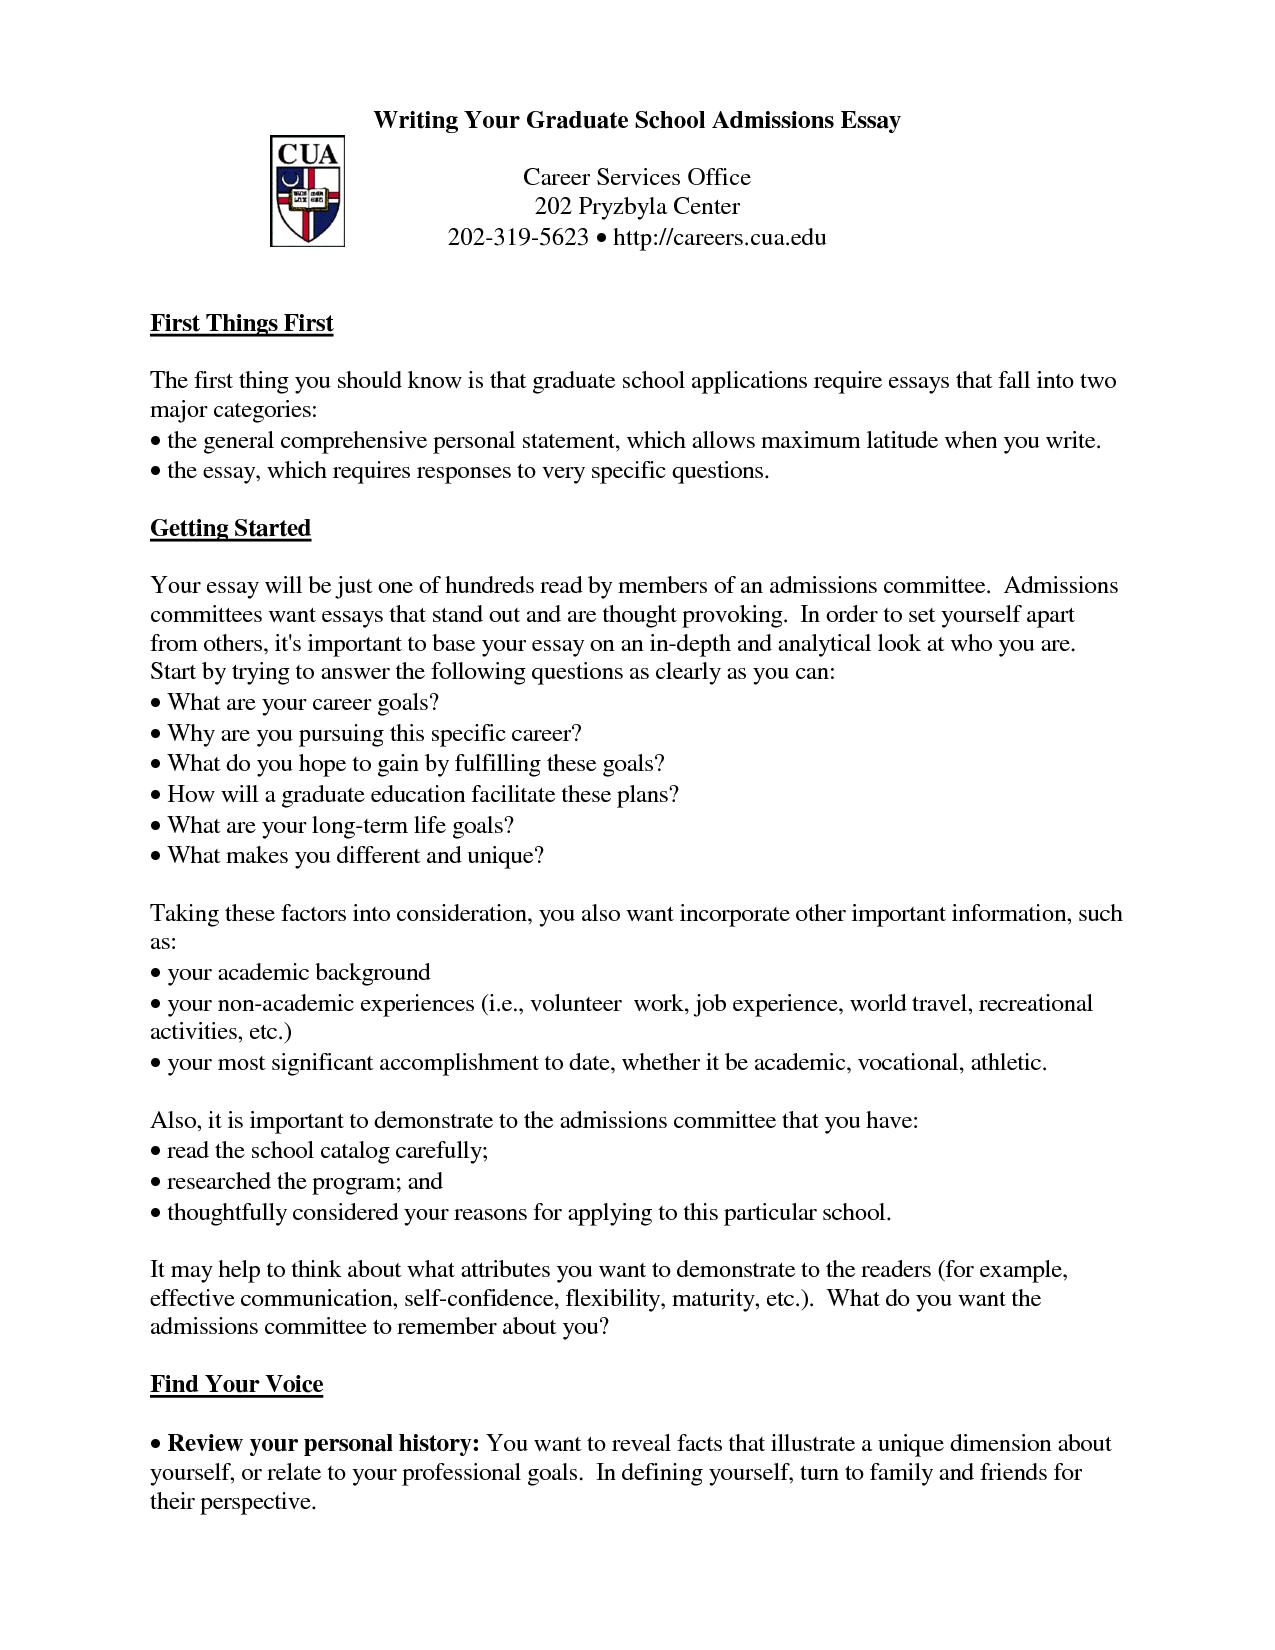 003 Essay For Master Degree Application Example Rare Sample Full